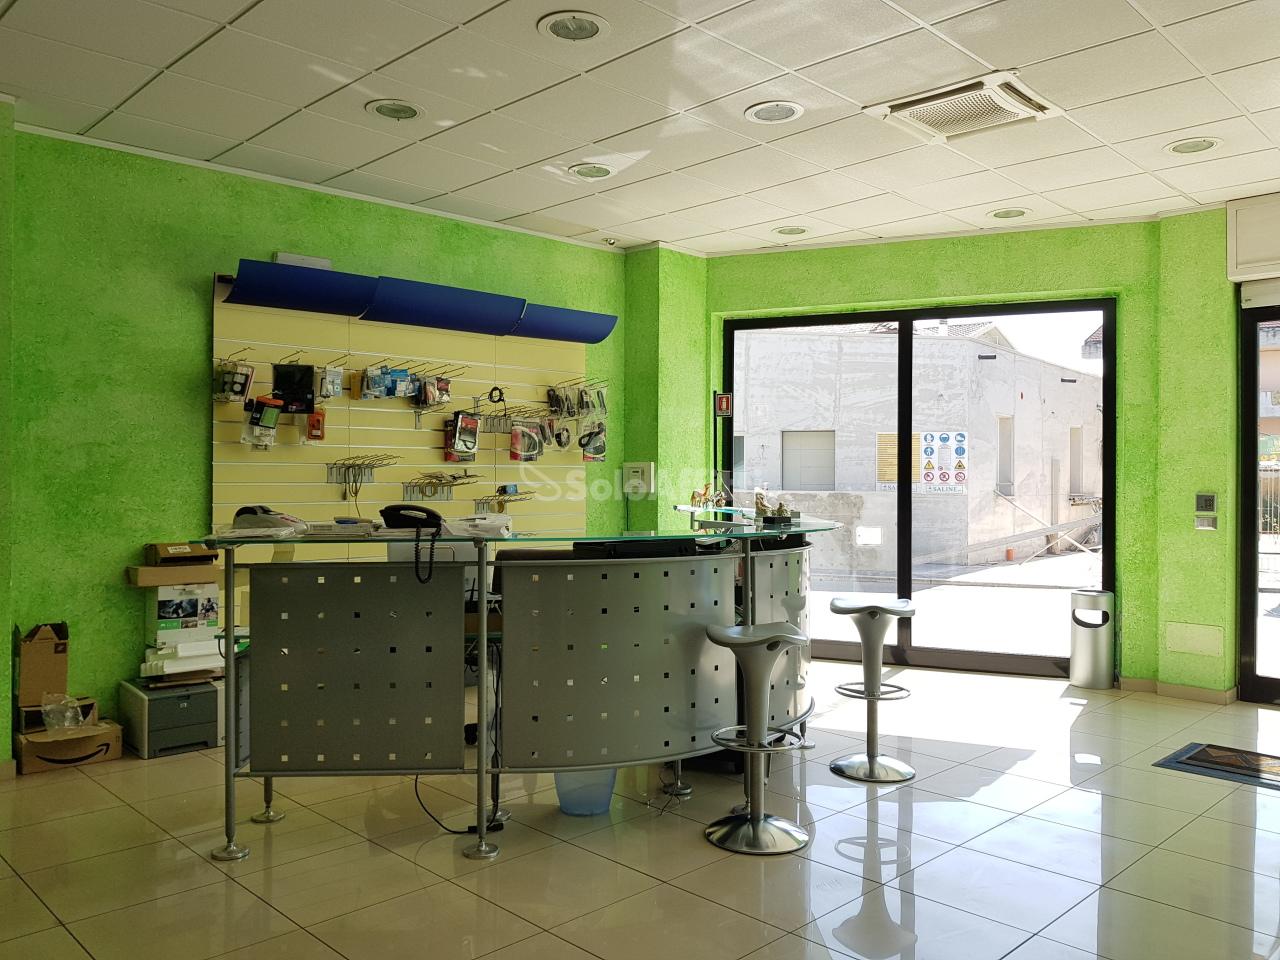 Fondo/negozio - 5 vetrine/luci a Santa Filomena, Montesilvano Rif. 6446397